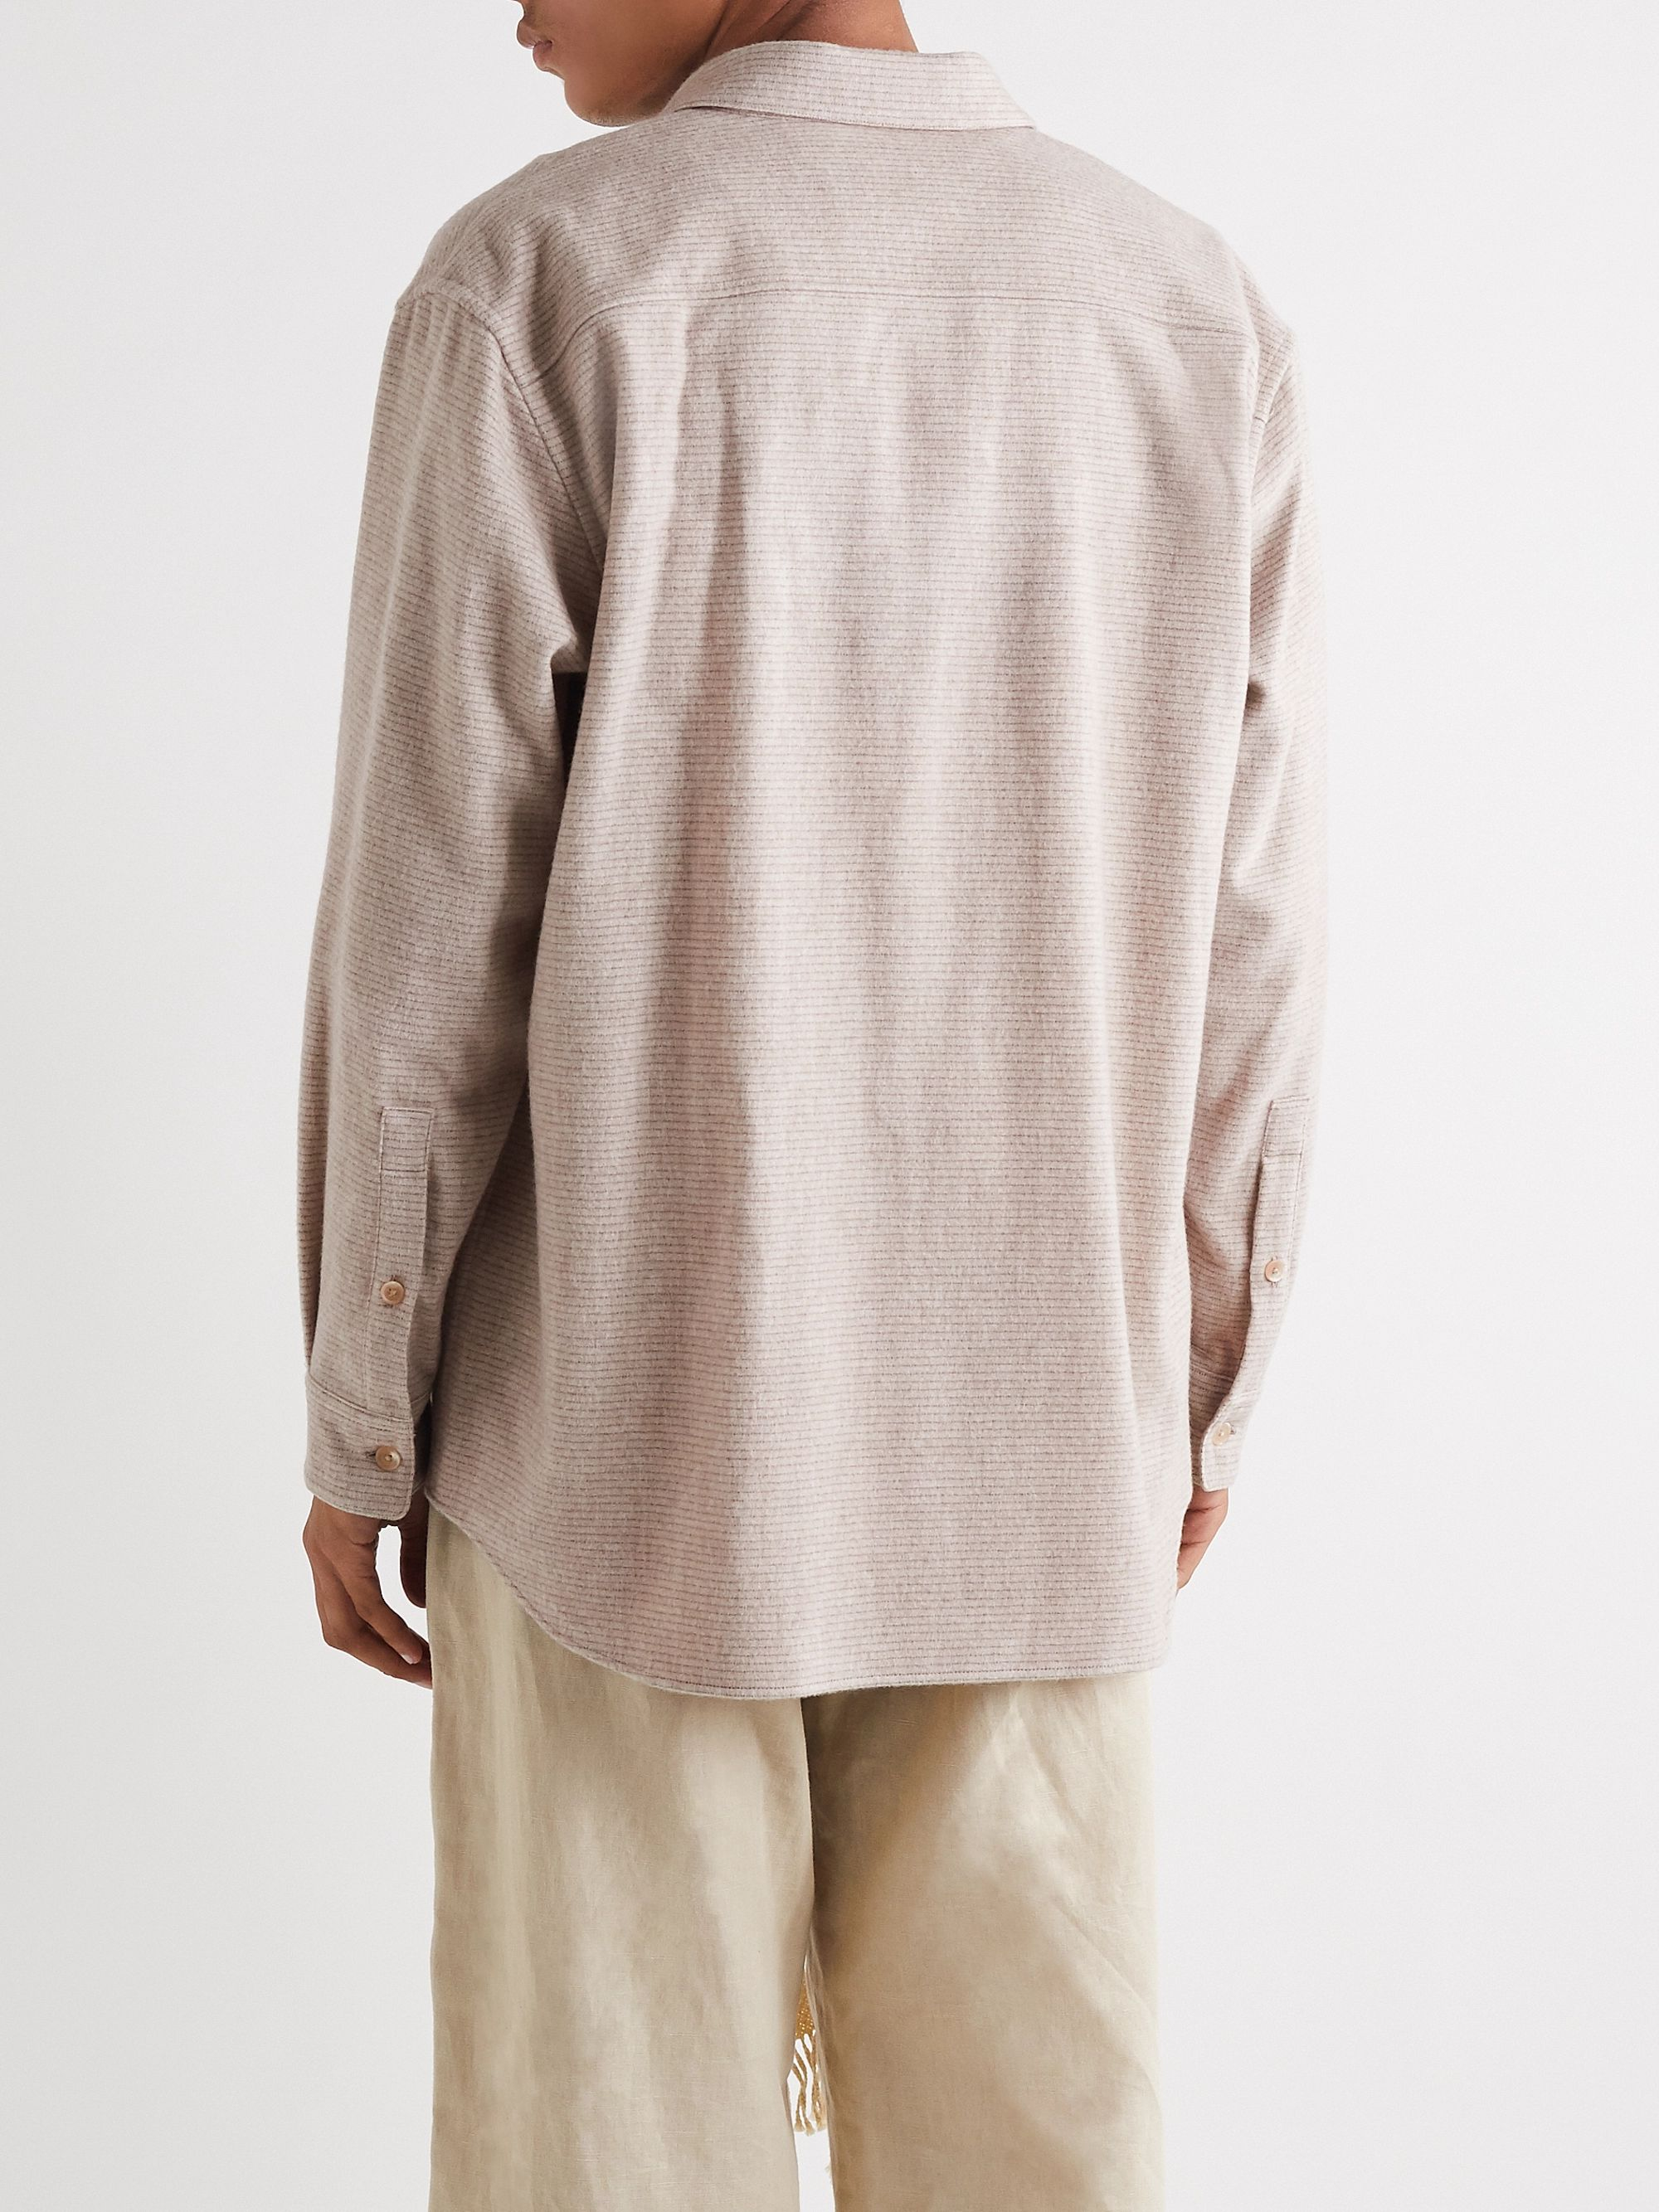 Beige Striped Wool And Cashmere-blend Overshirt   Auralee